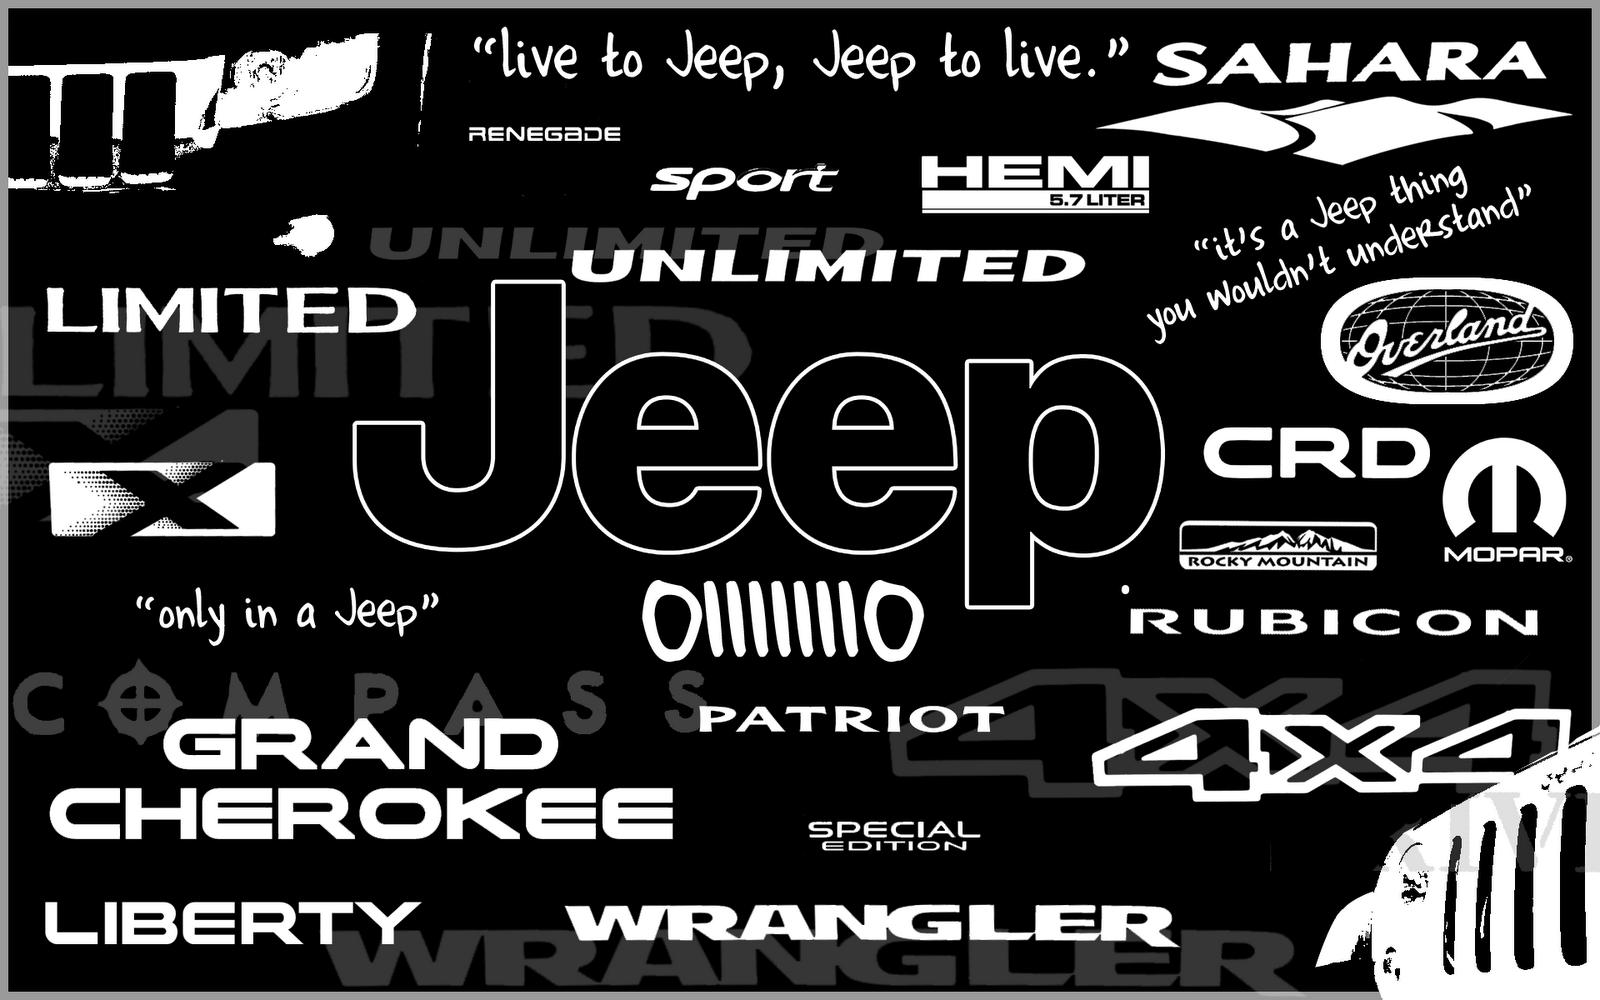 Free Download Jeep Logo Hd Wallpaper For Desktop 4614 Full Size